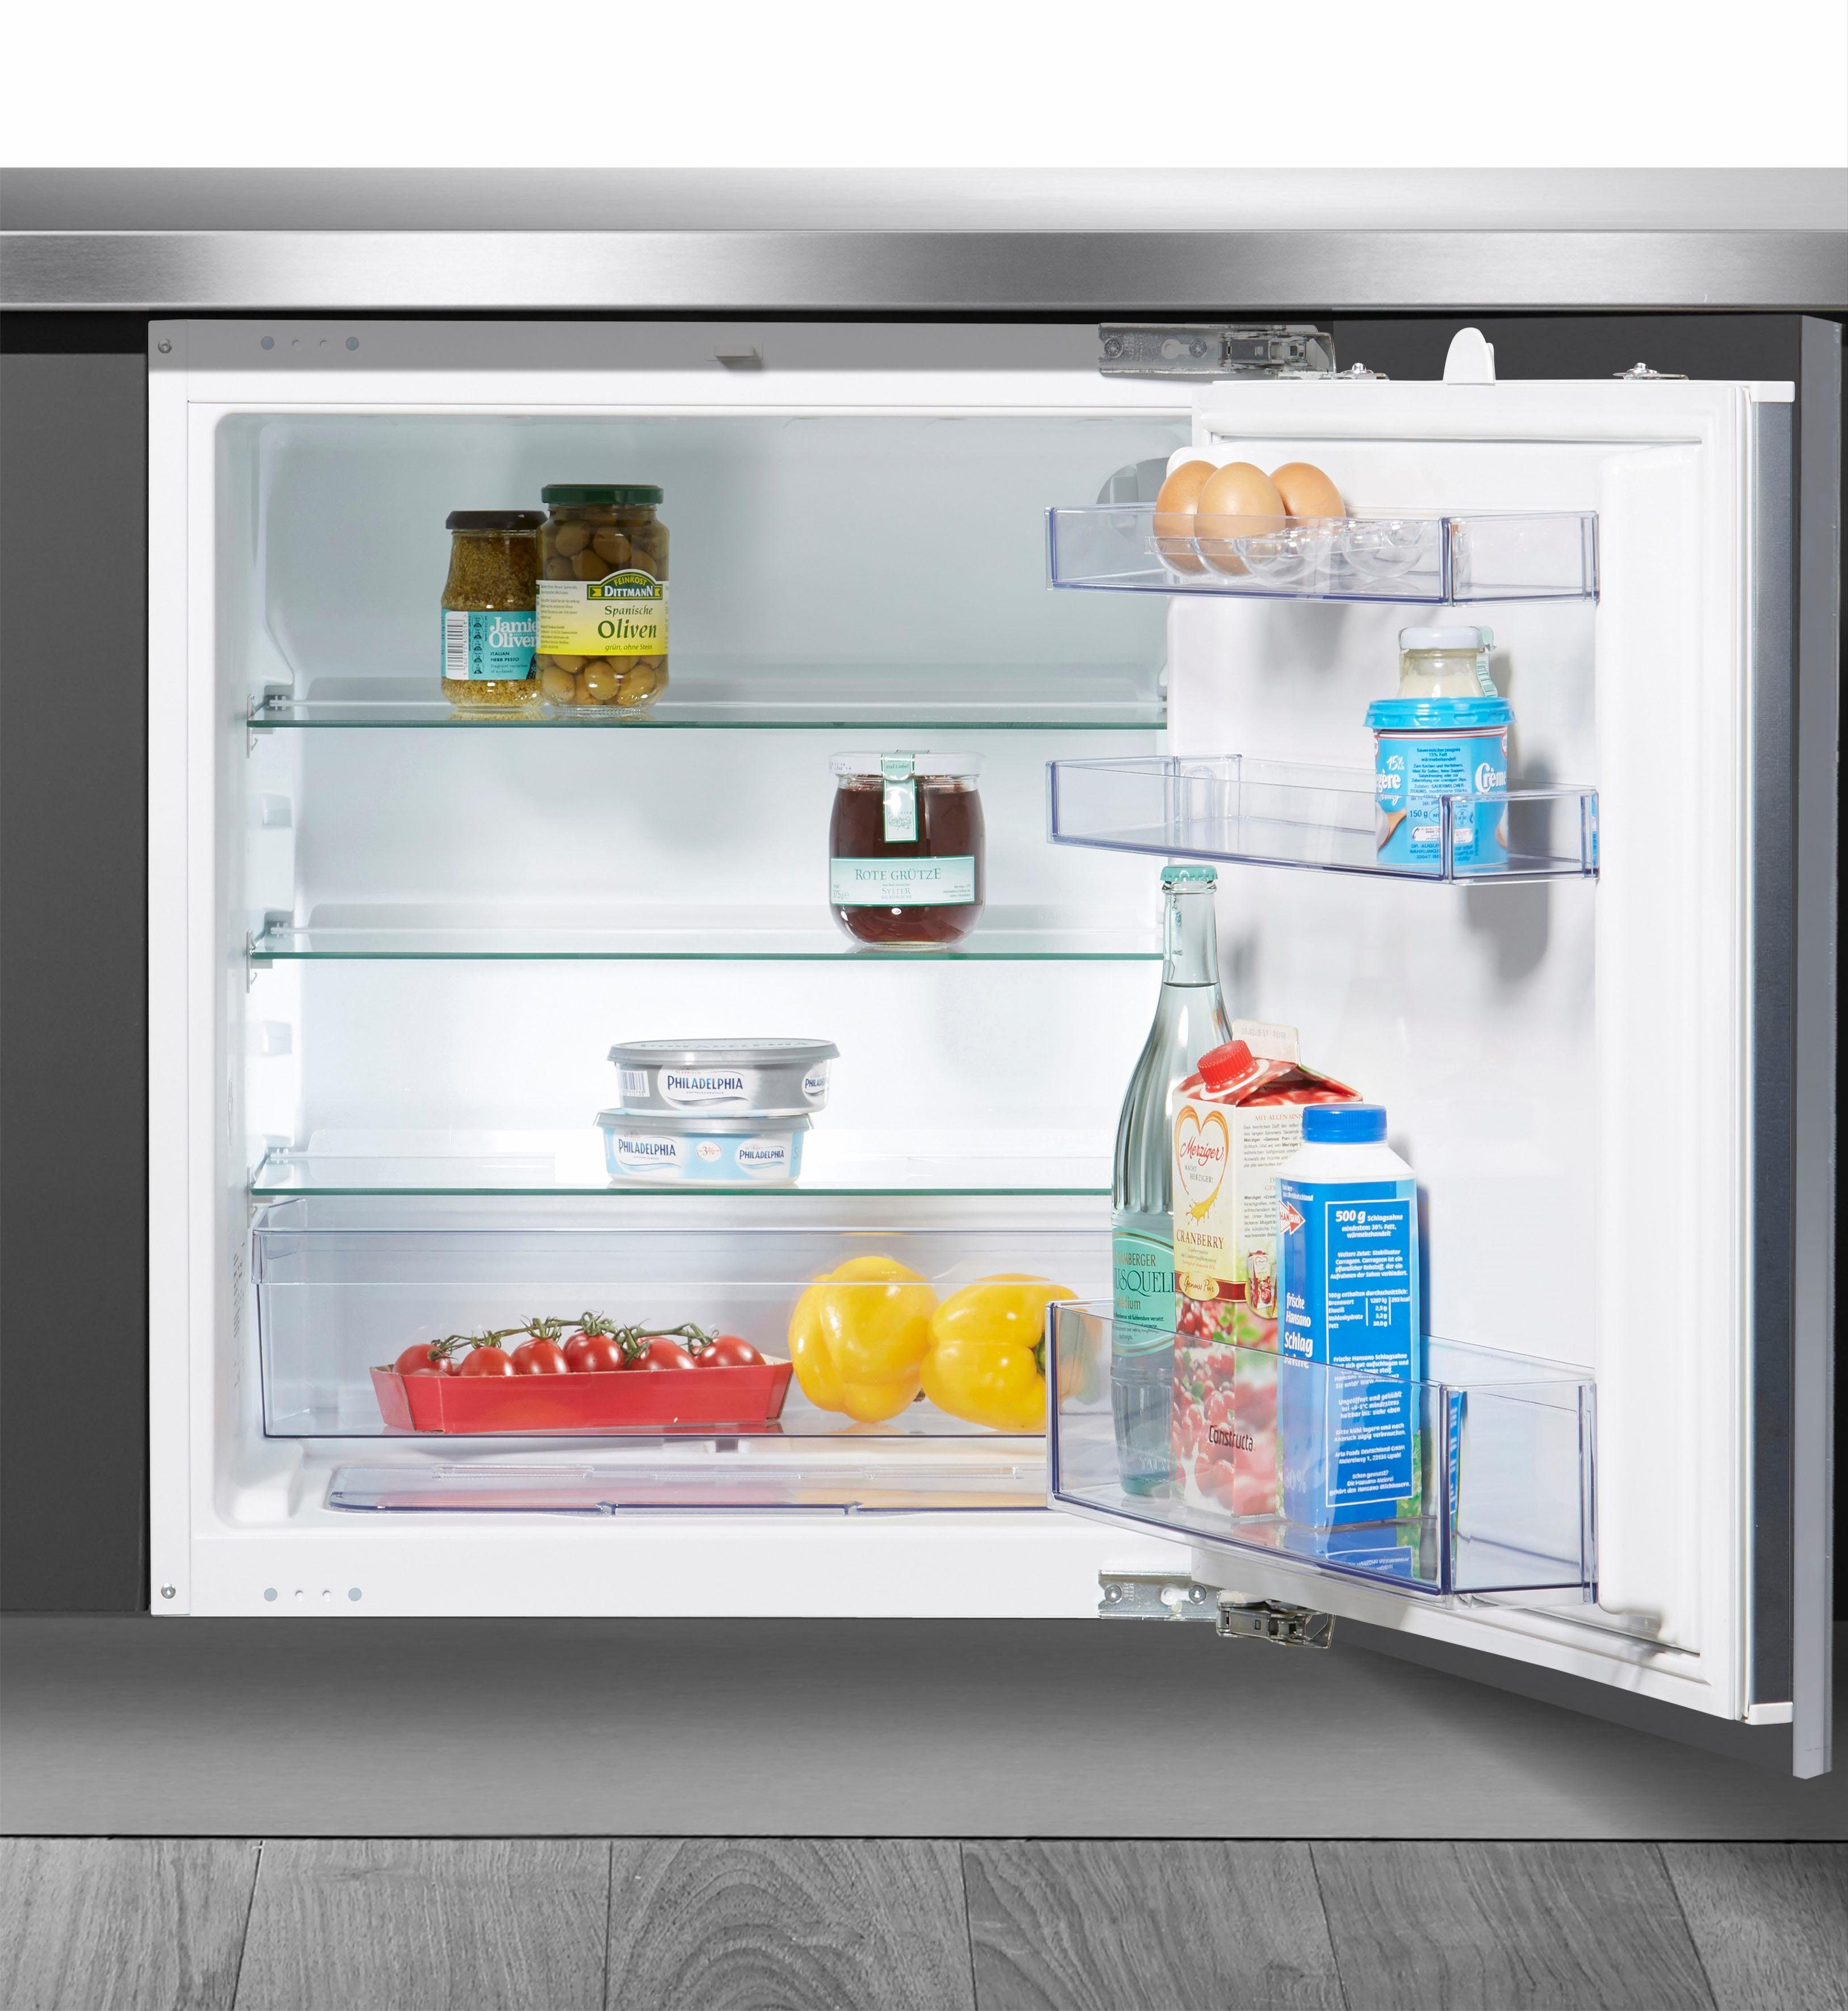 Constructa Einbaukühlschrank CK60144, 82,0 cm hoch, 59,8 cm breit, A+, 82 cm hoch